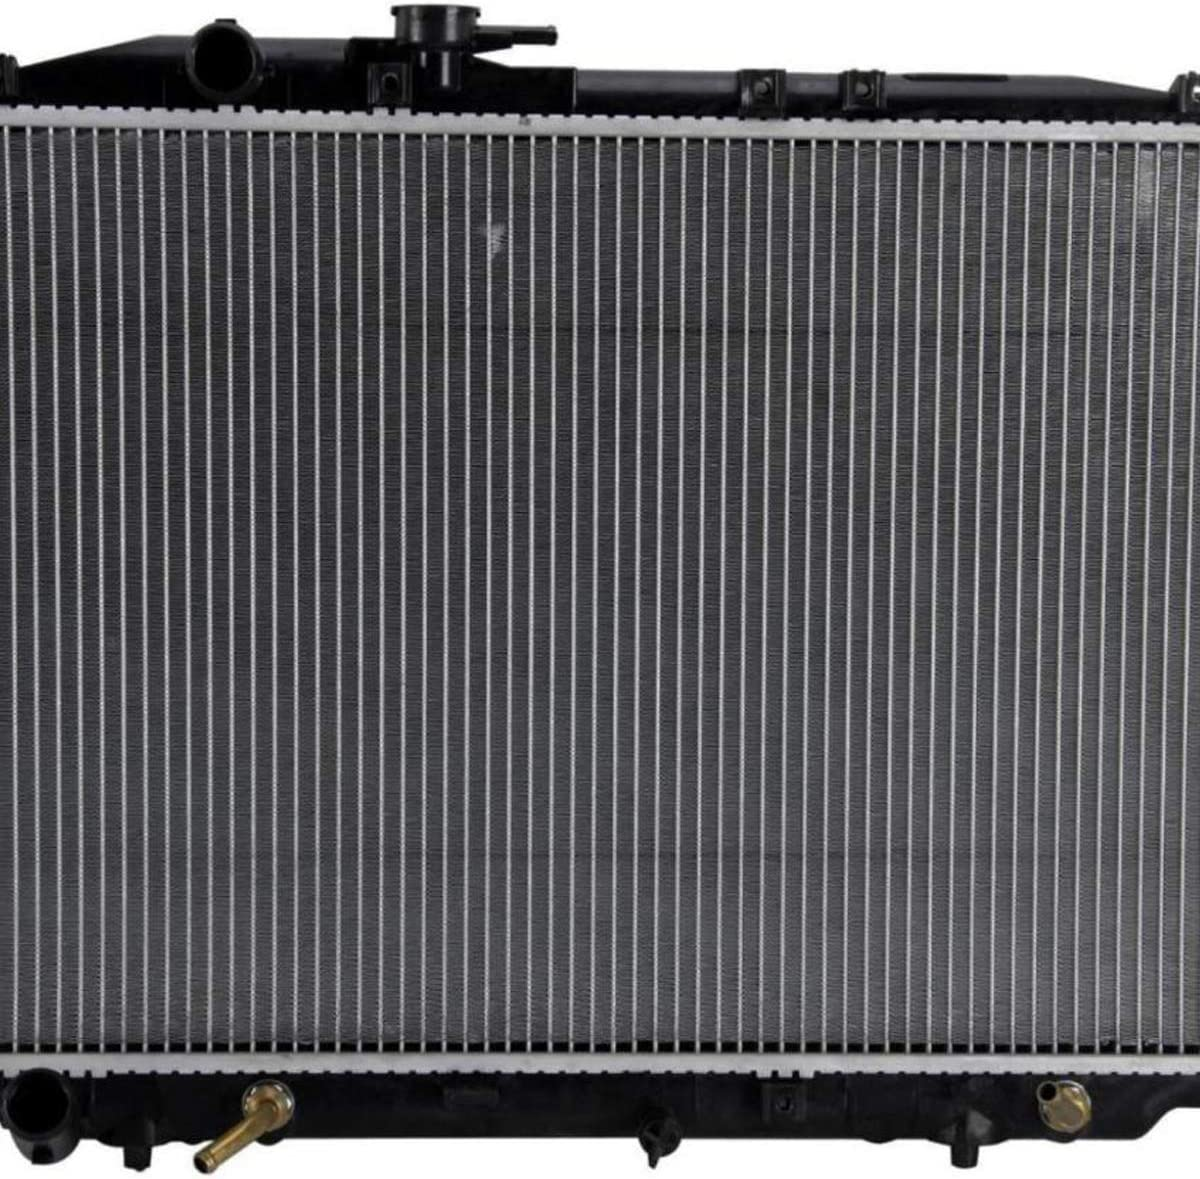 2814 BESUTO Radiator for Acura RL 2005 2006 2007 2008 3.5 V6